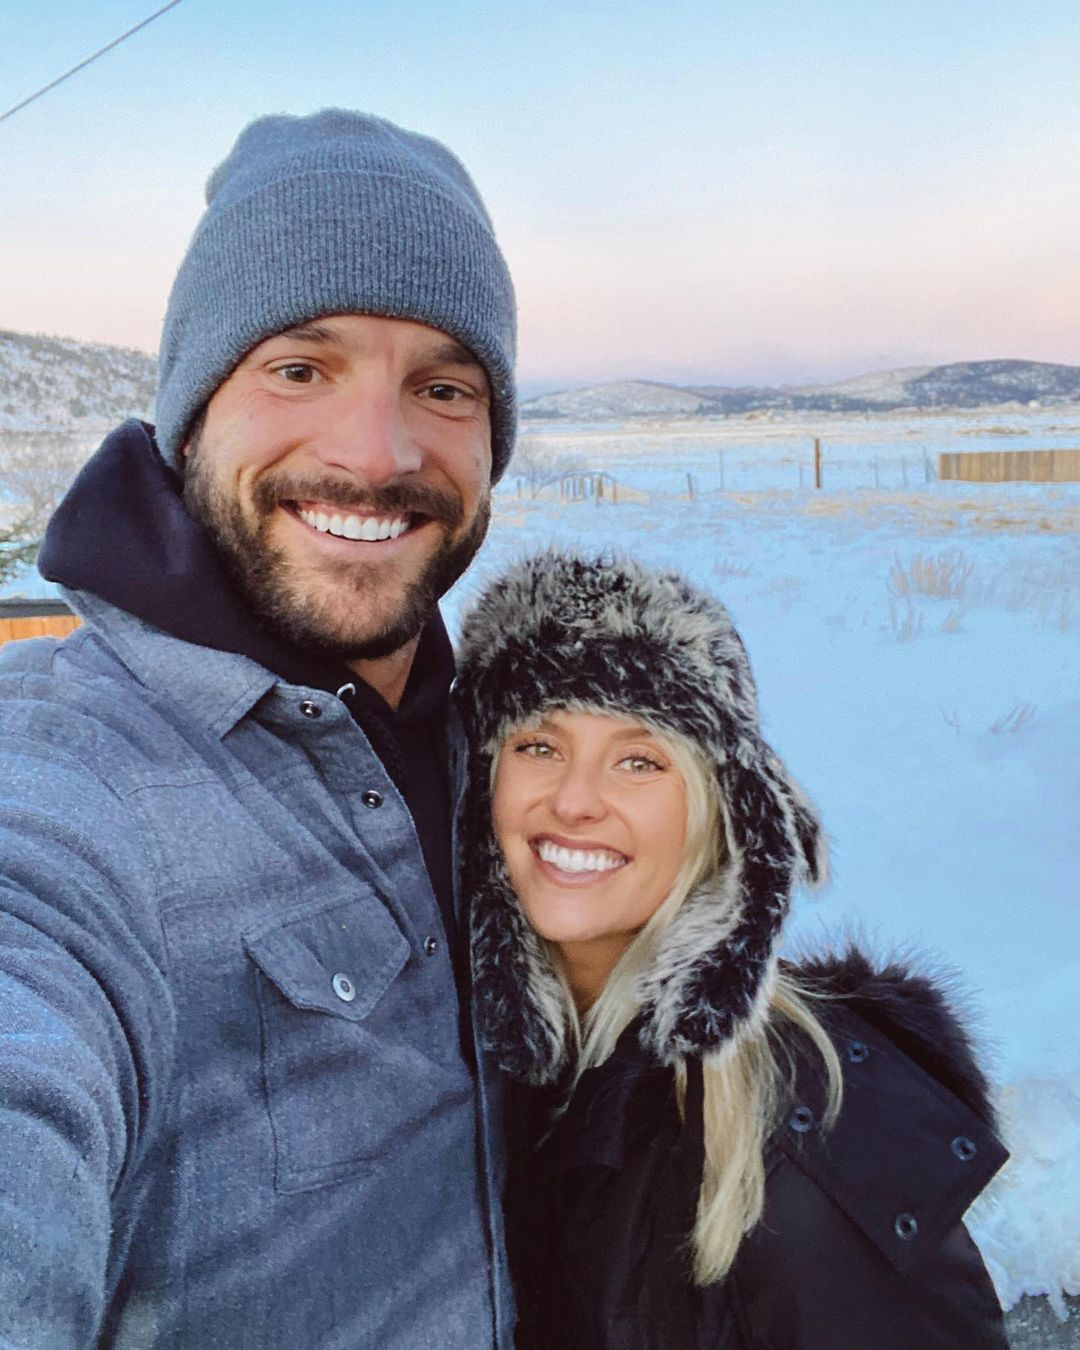 Garrett Yrigoyen Spends Thanksgiving With New Girlfriend Alex Farrar in Idaho